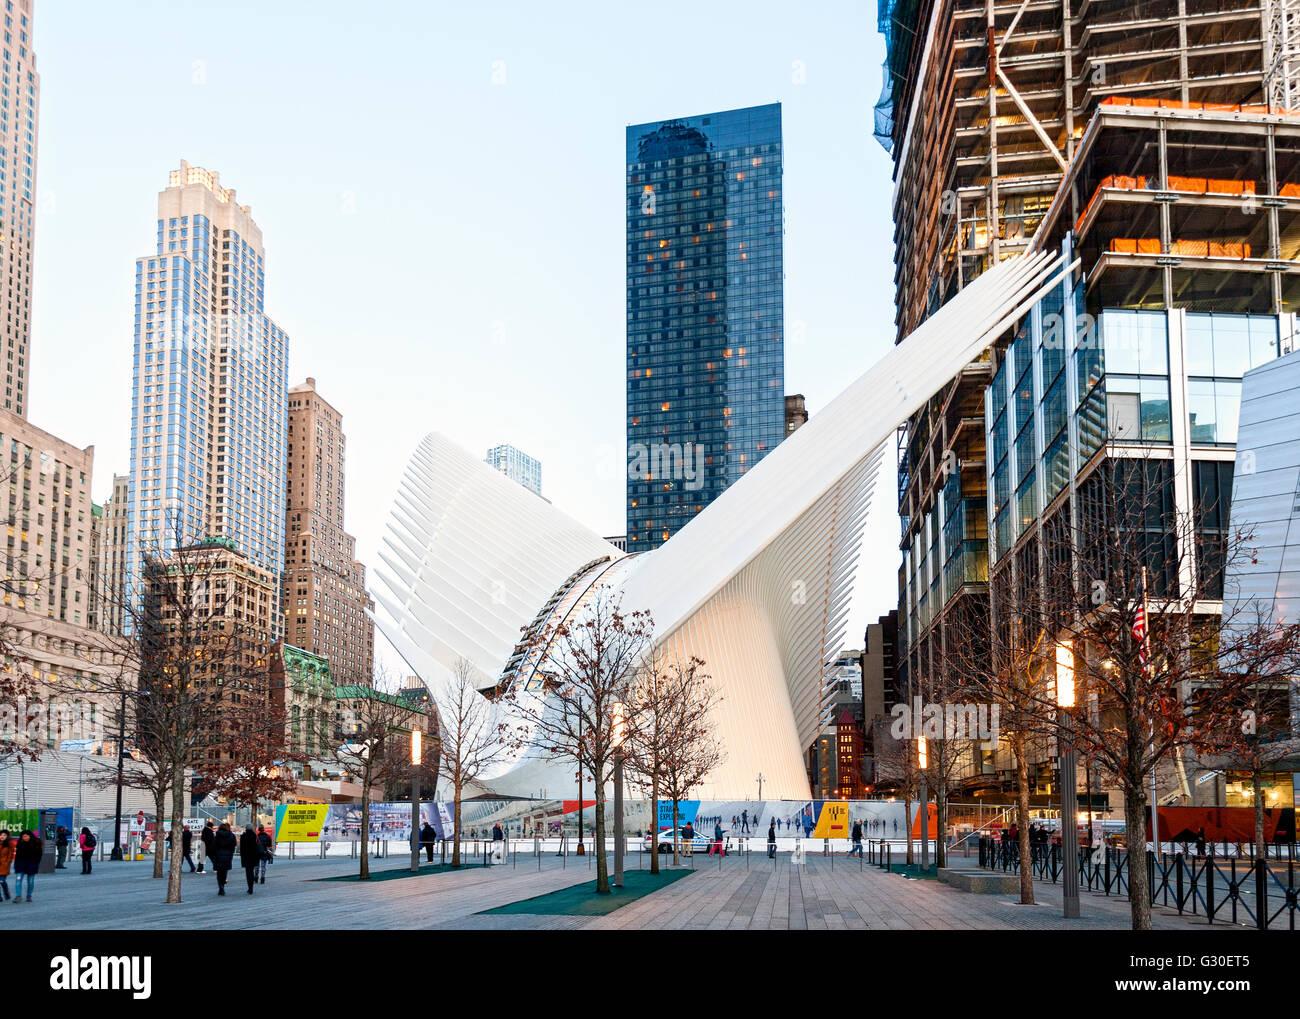 Oculus, the transportation hub by architect Santiago Calatrava, at the WTC 9/11 Memorial Plaza, Manhattan, New York - Stock Image